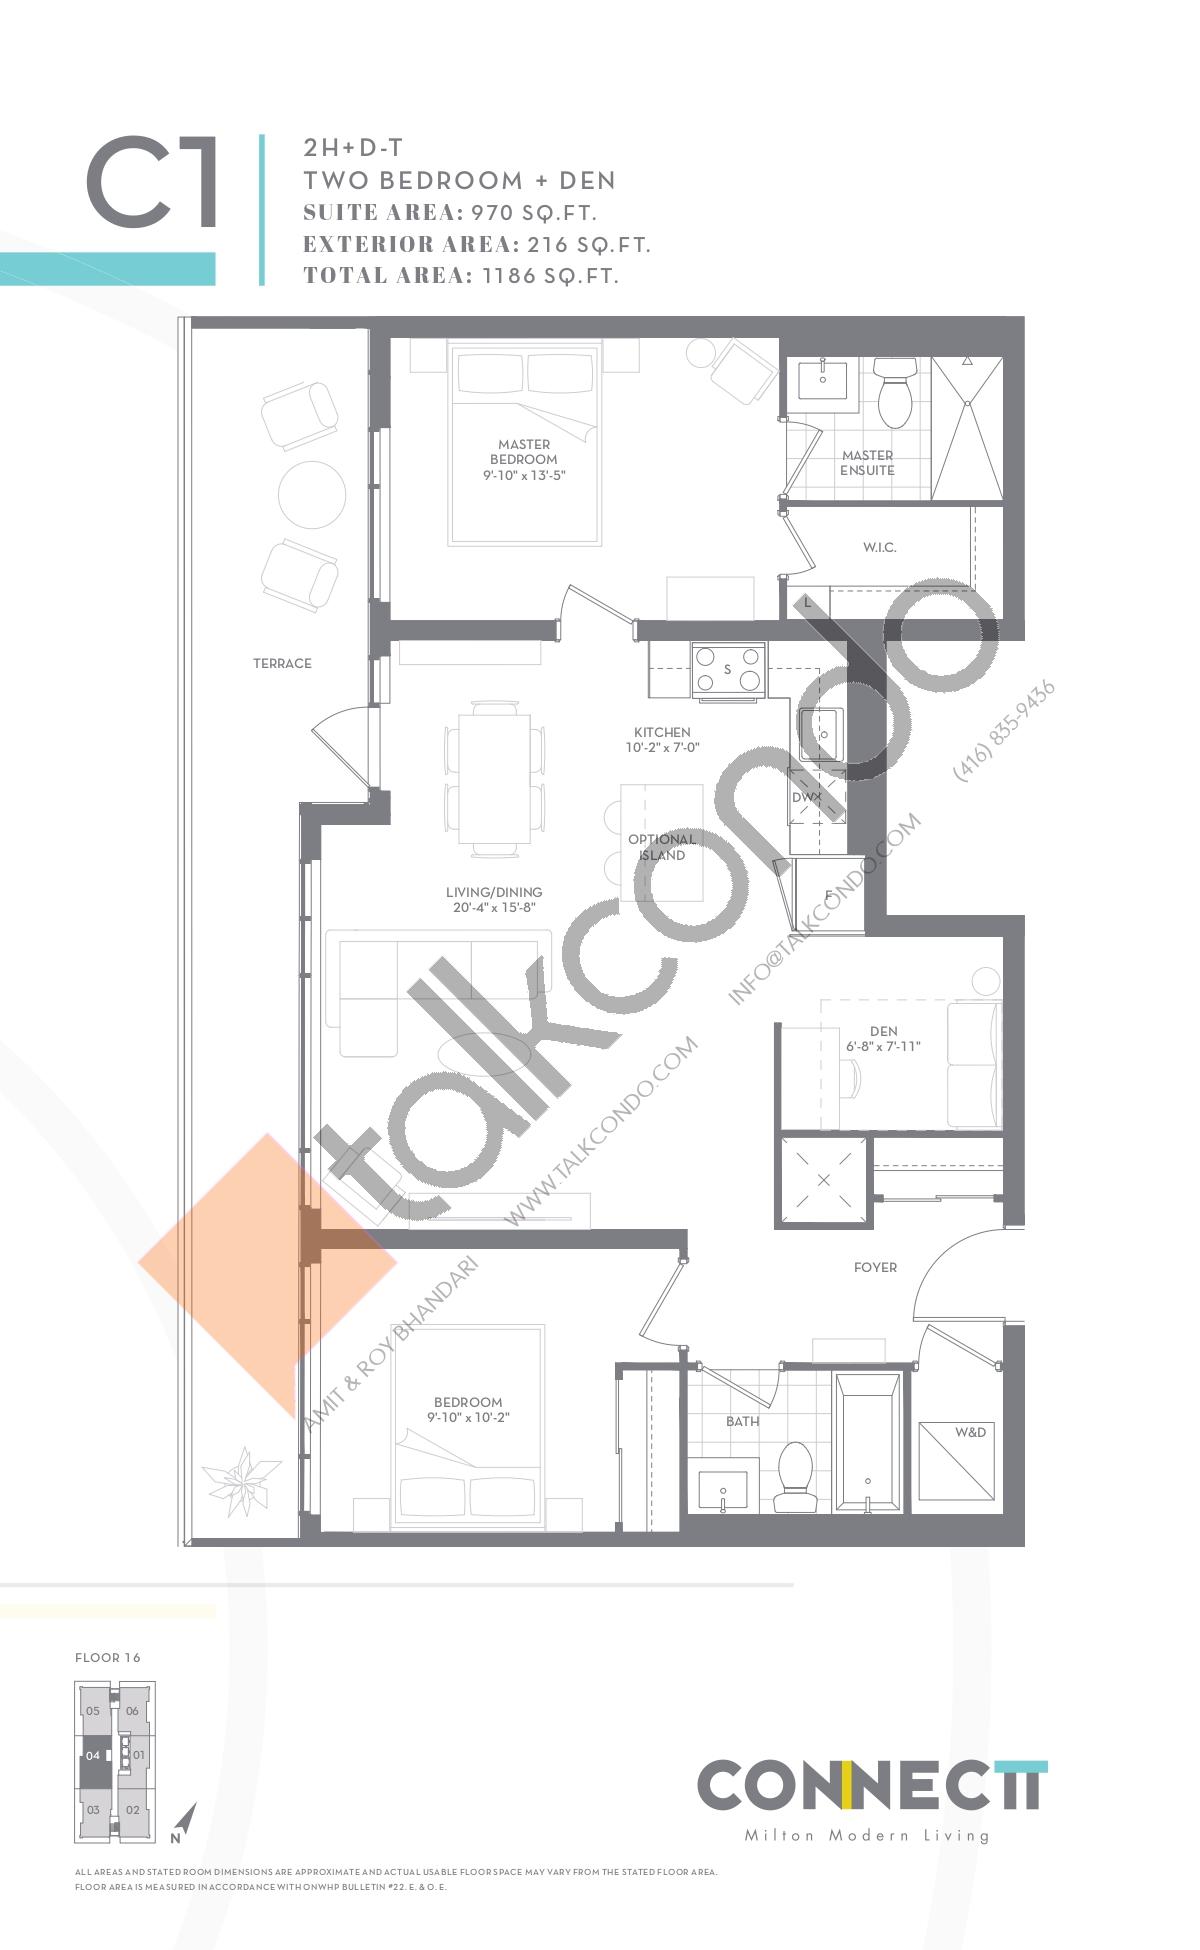 2H+D-T Floor Plan at Connectt Urban Community Condos - 970 sq.ft